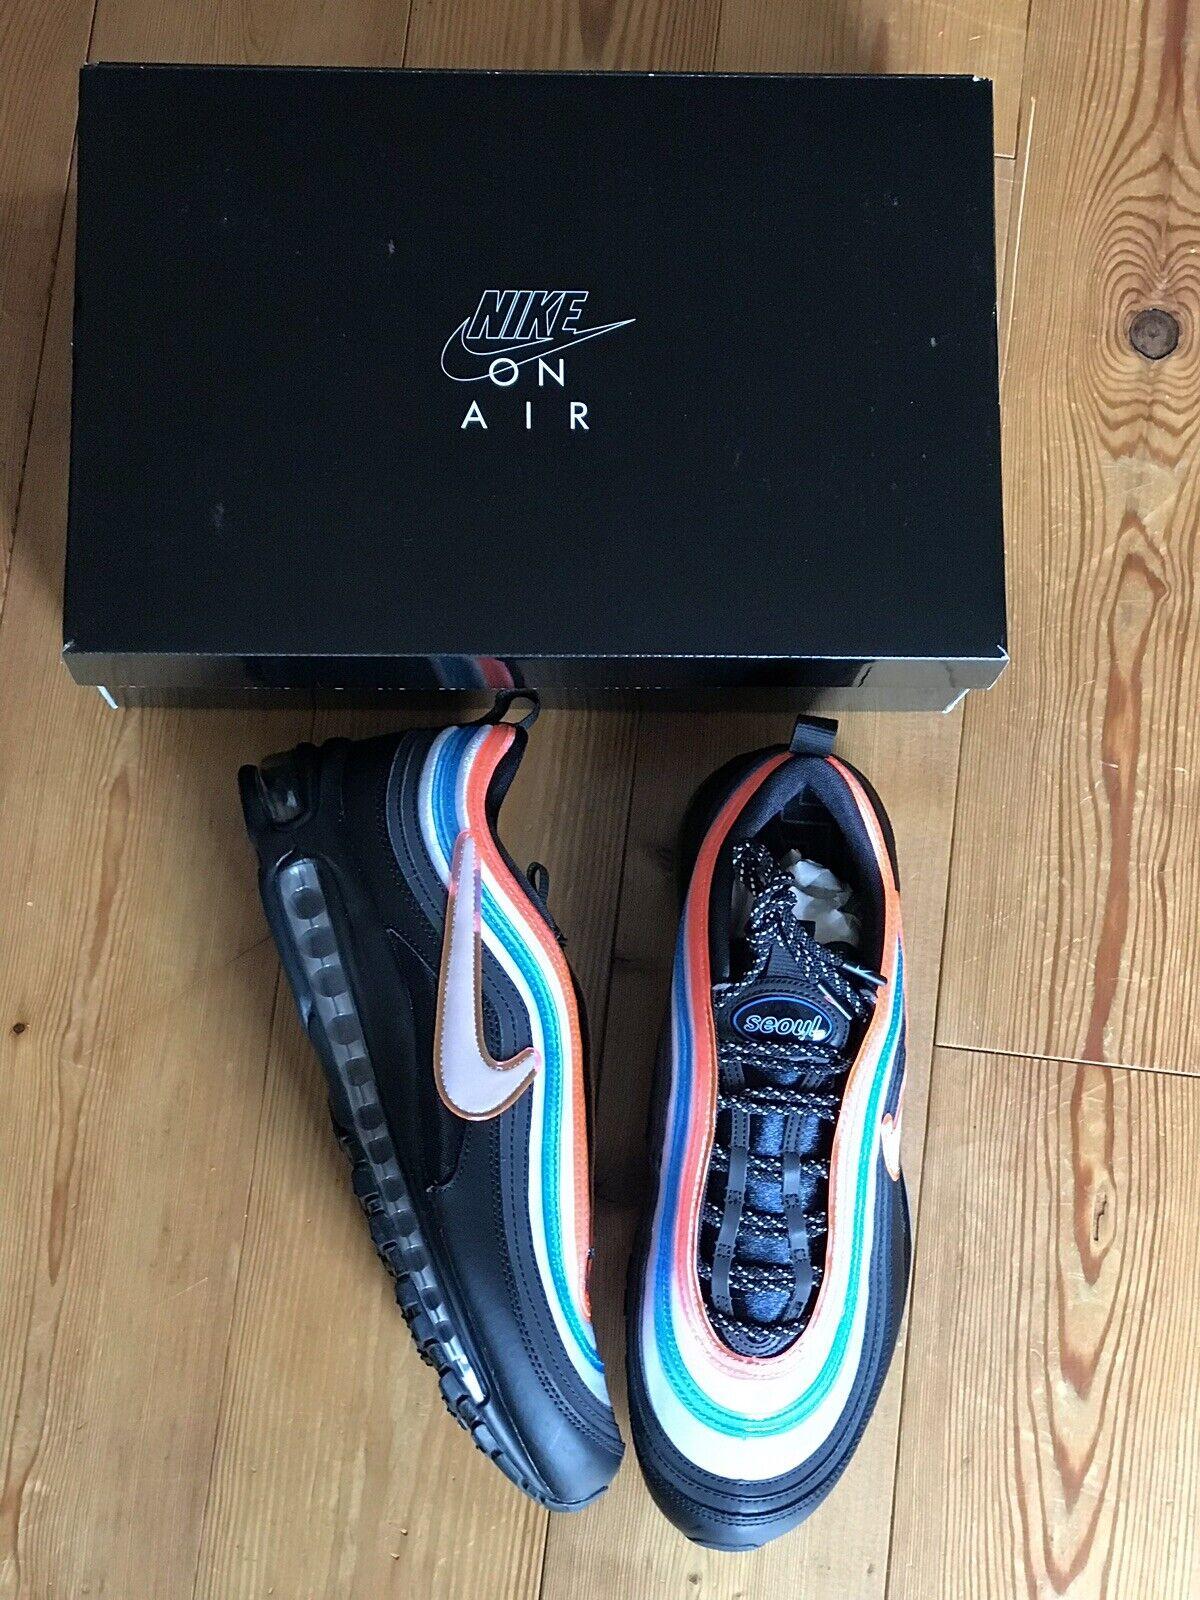 Neon Eu Us Ovp On 12 Air Rsafcc8c83189 Nike Neu 97 Max Seoul 46 xoedrCQBW